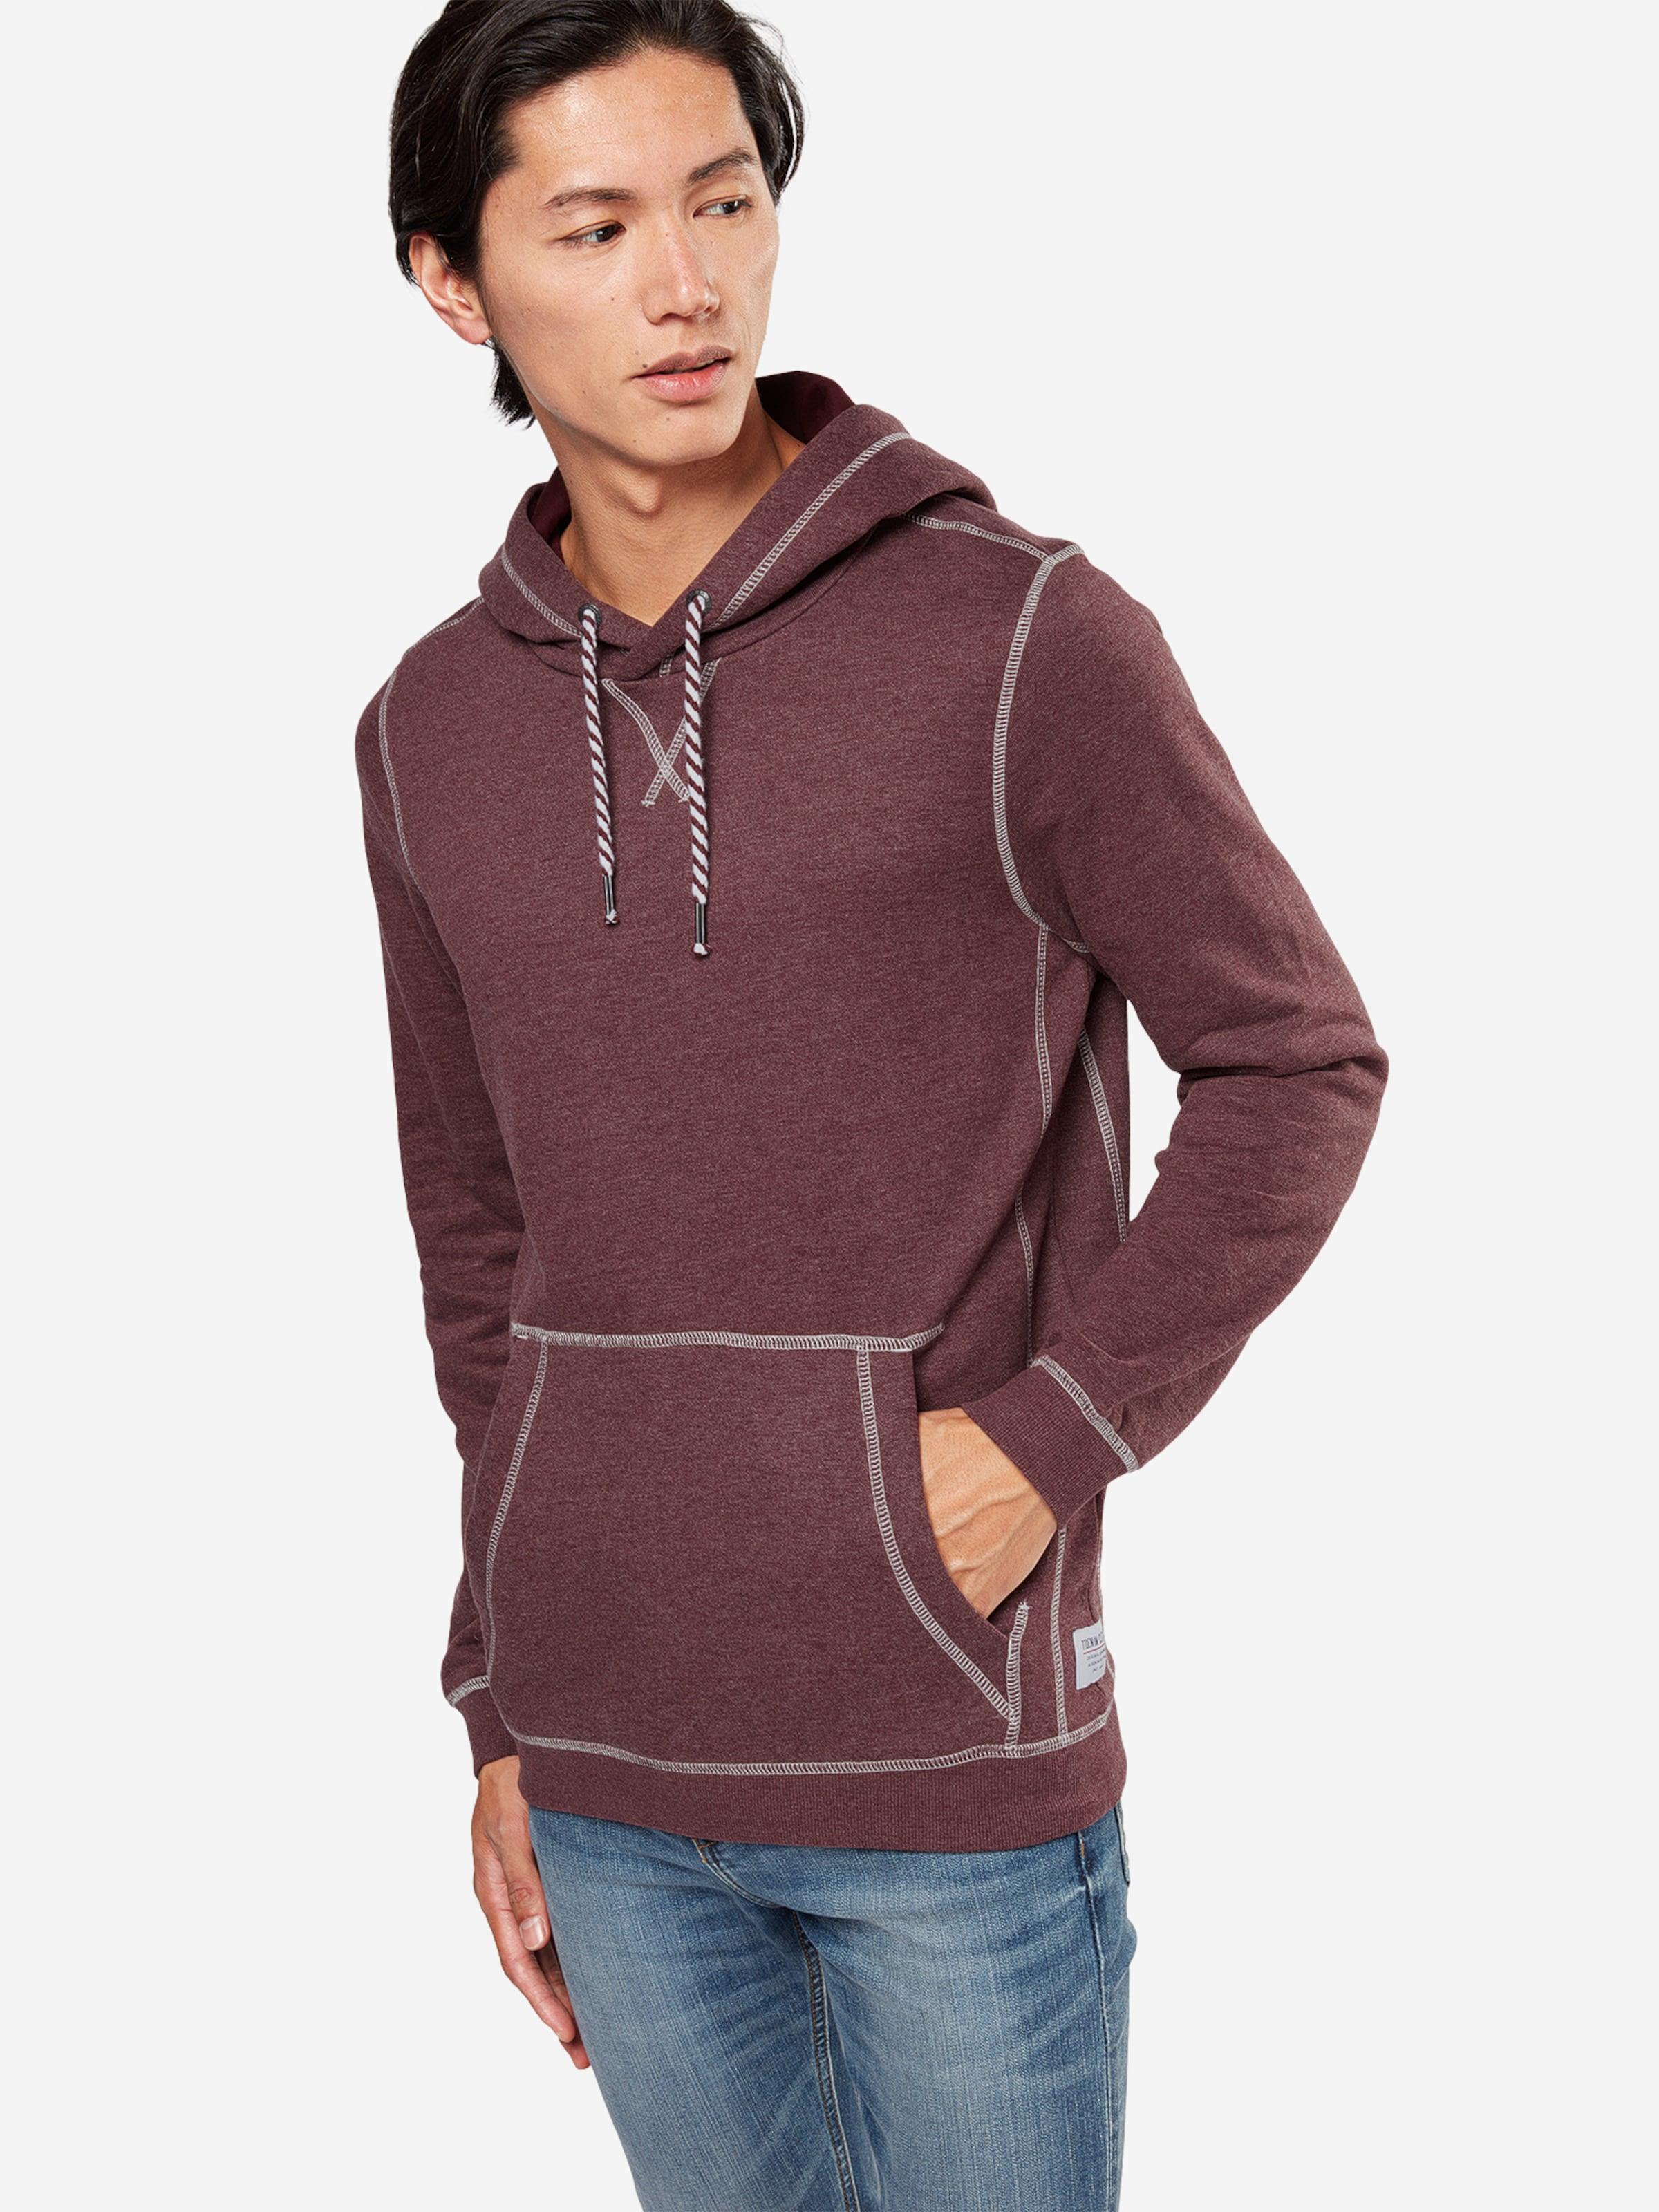 TOM TAILOR DENIM Sweatshirt 'hoody with contrast stitchings' Auslass Besuch Gut Verkaufen l08vm7j